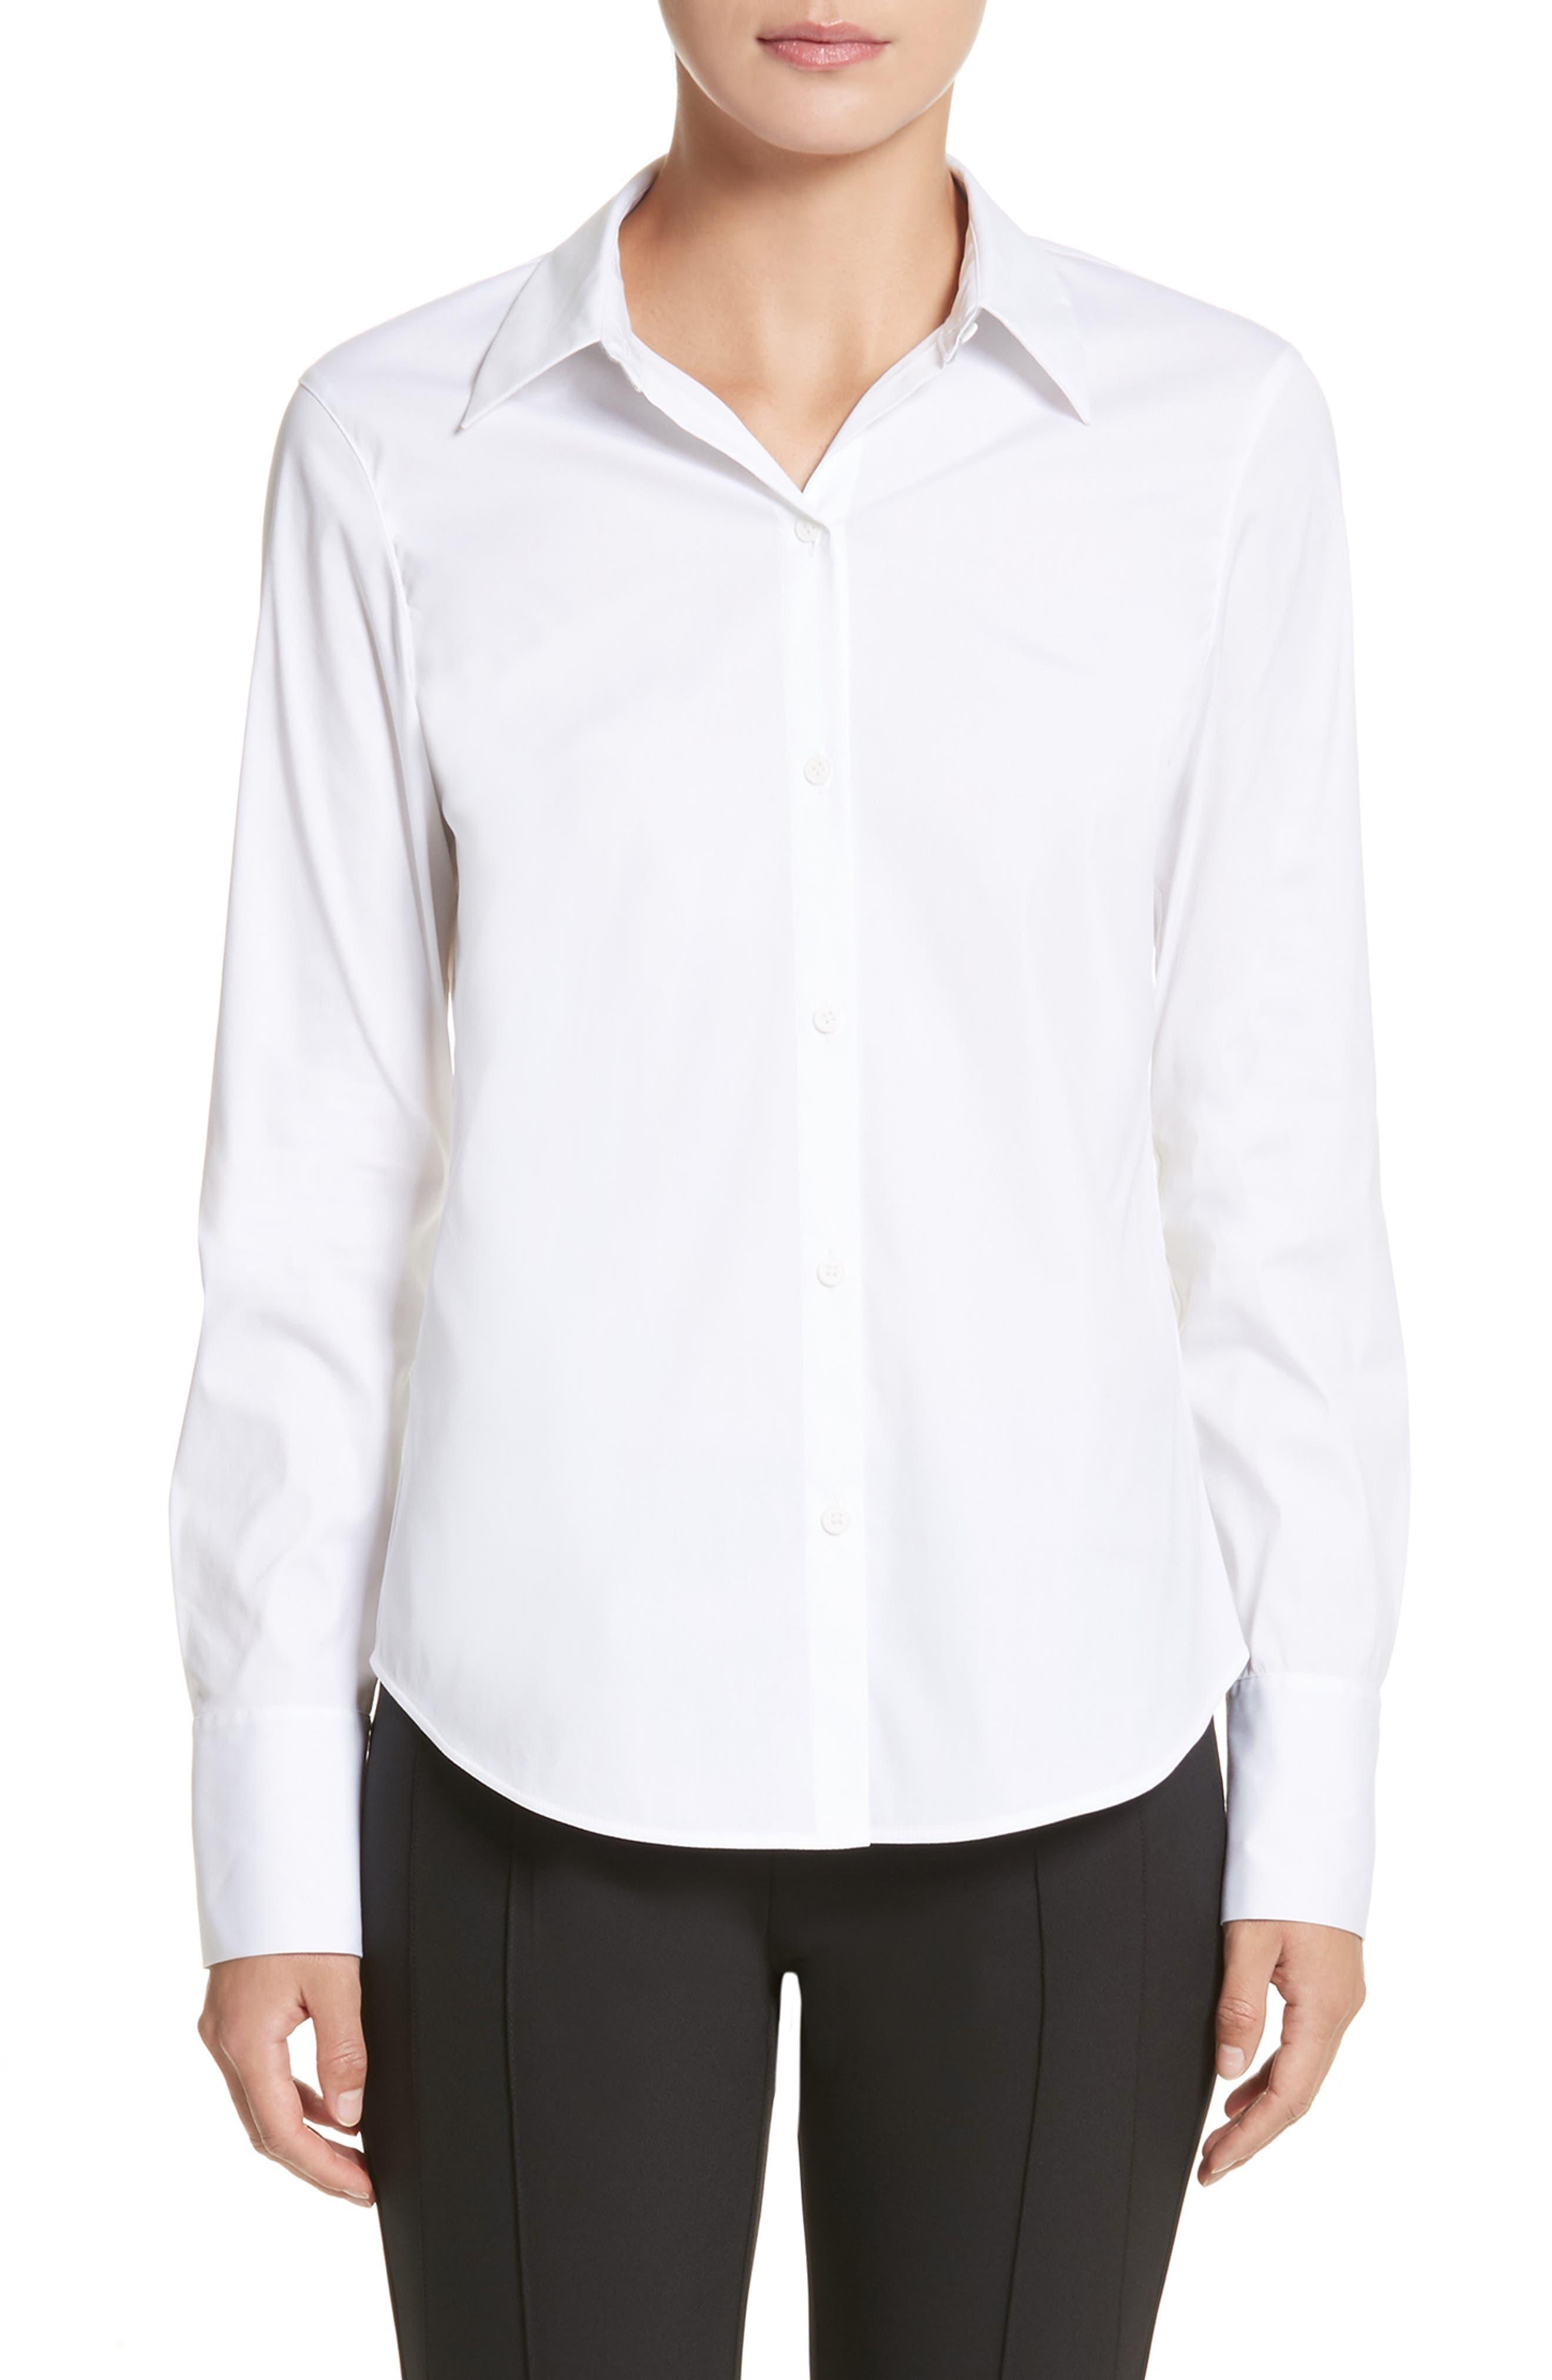 Linley Stretch Cotton Blouse,                             Main thumbnail 1, color,                             WHITE